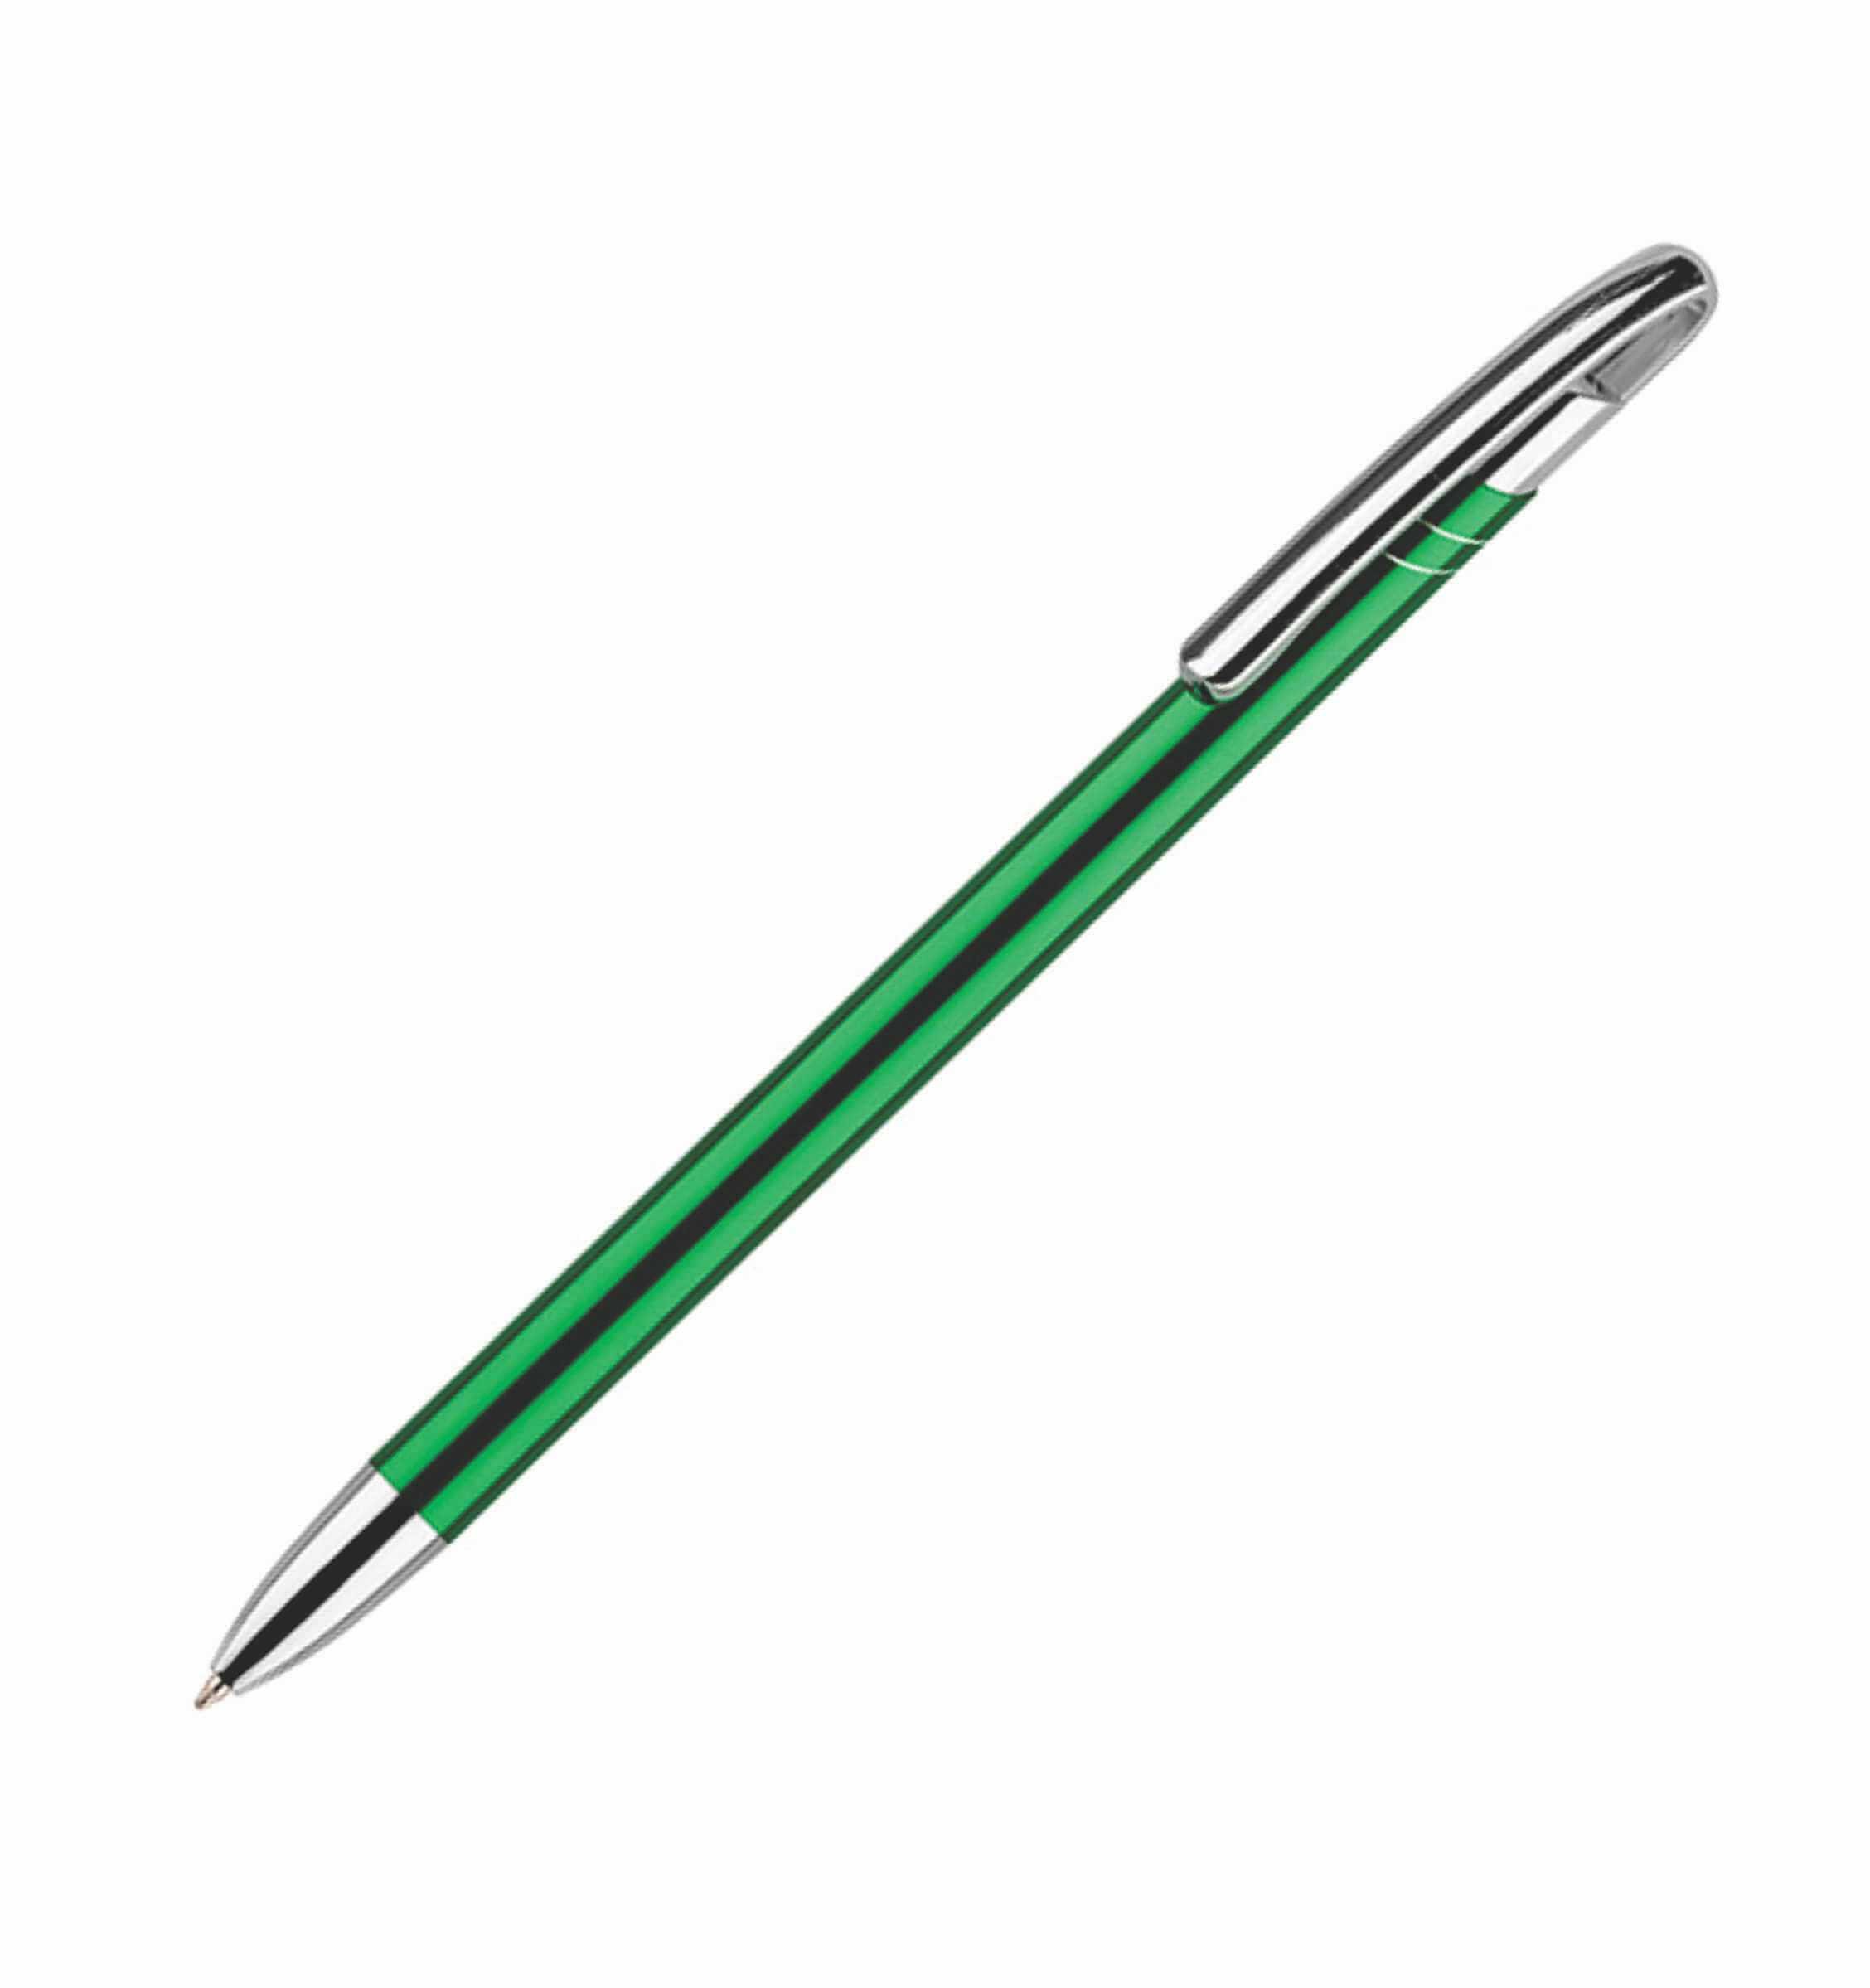 pix metalic avalo verde inchis